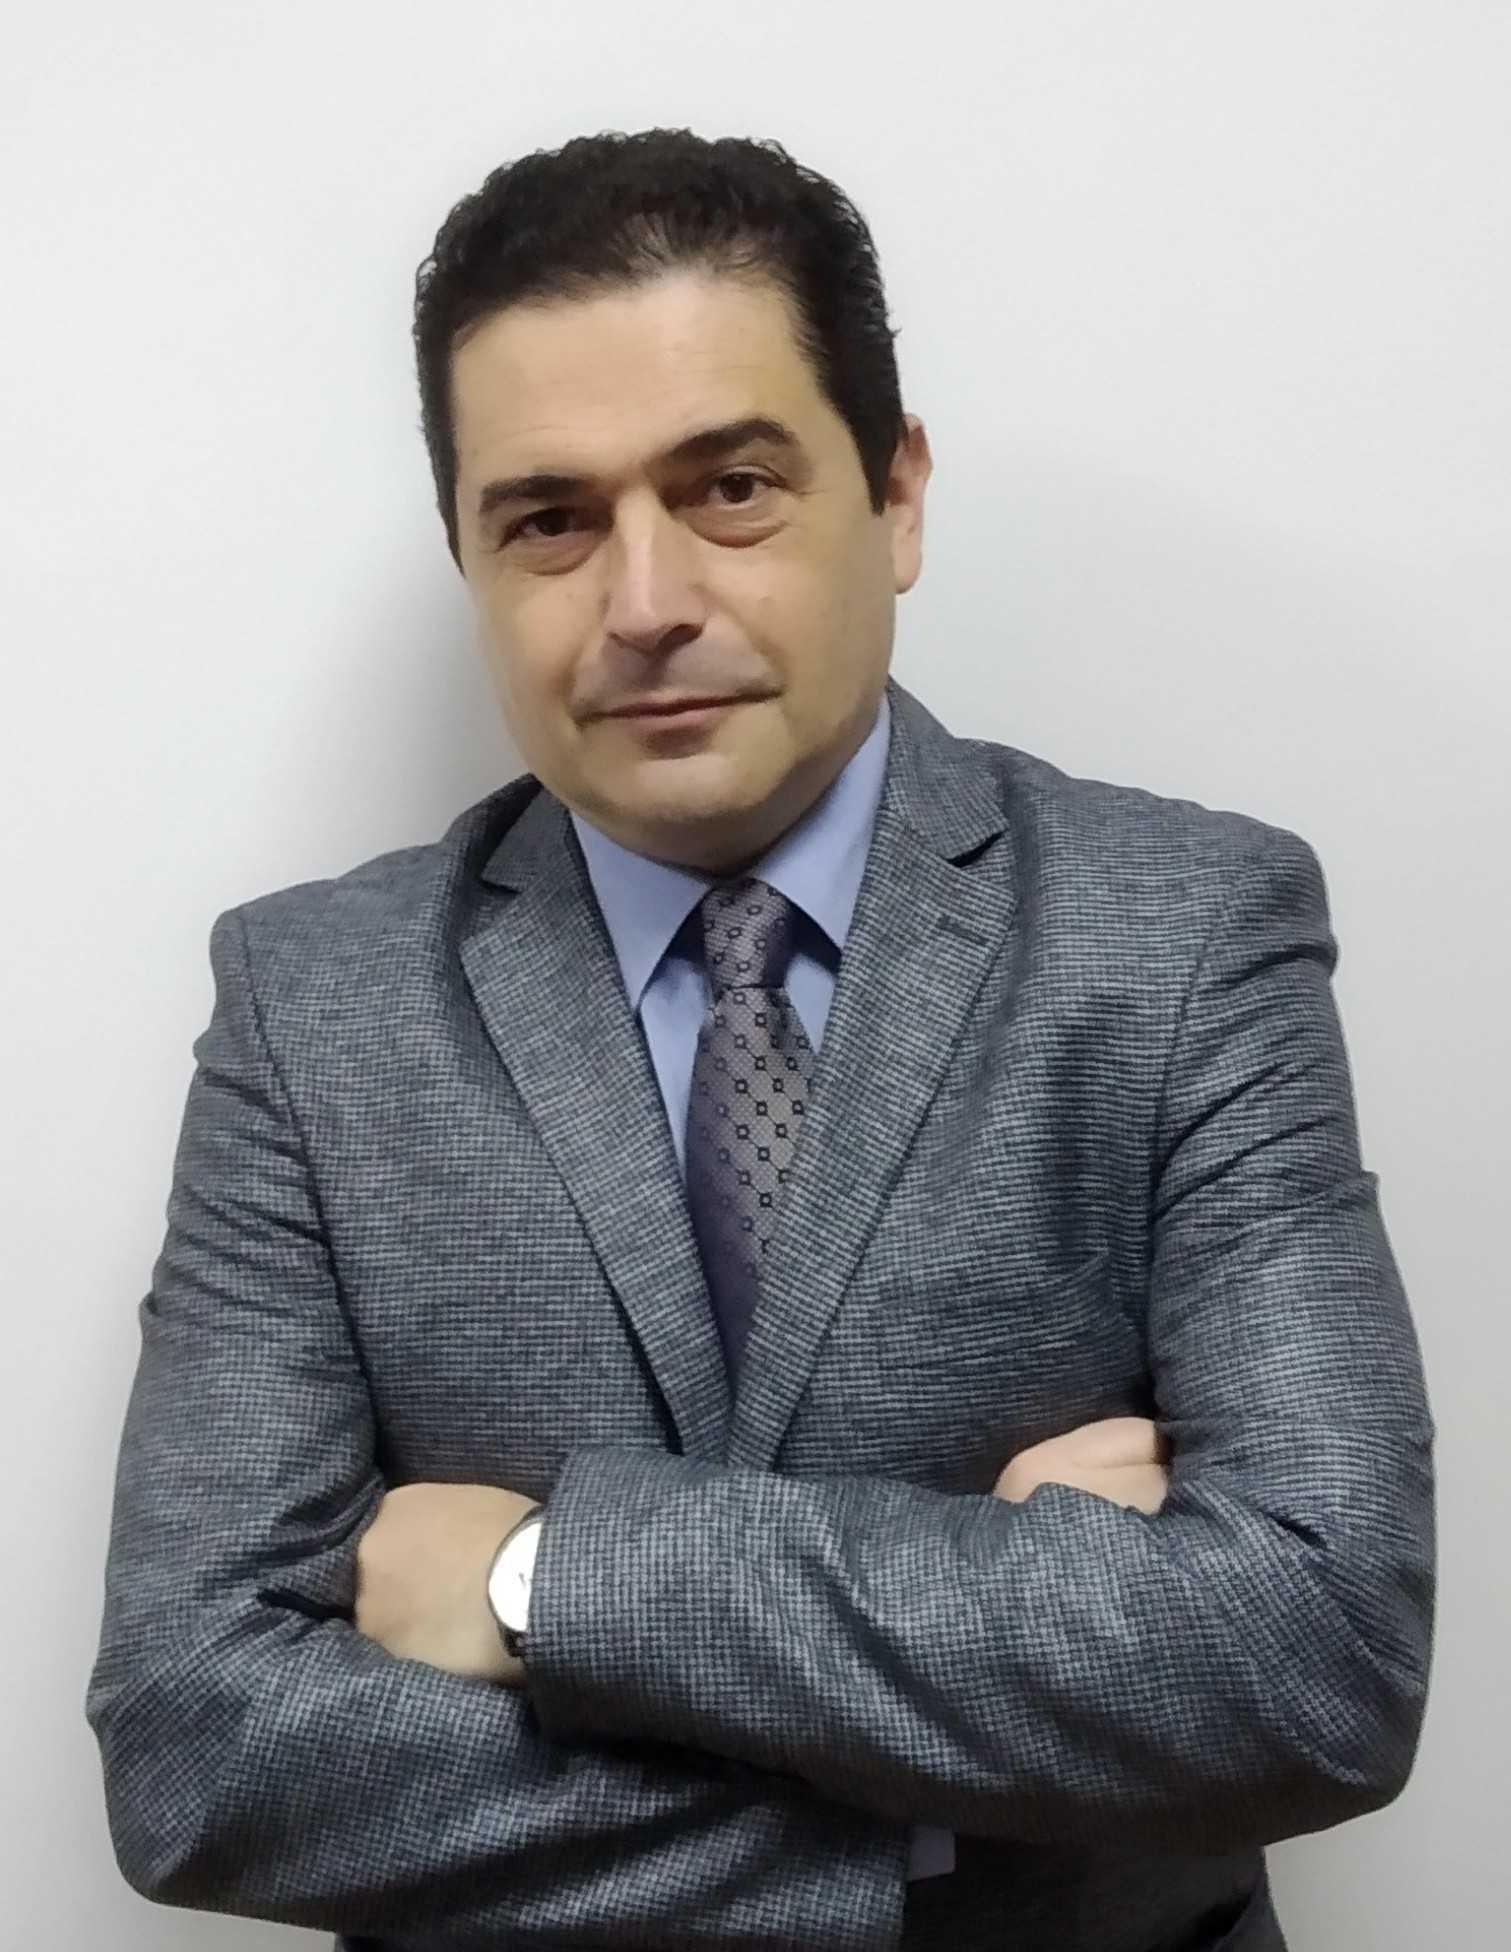 Milić Čurović